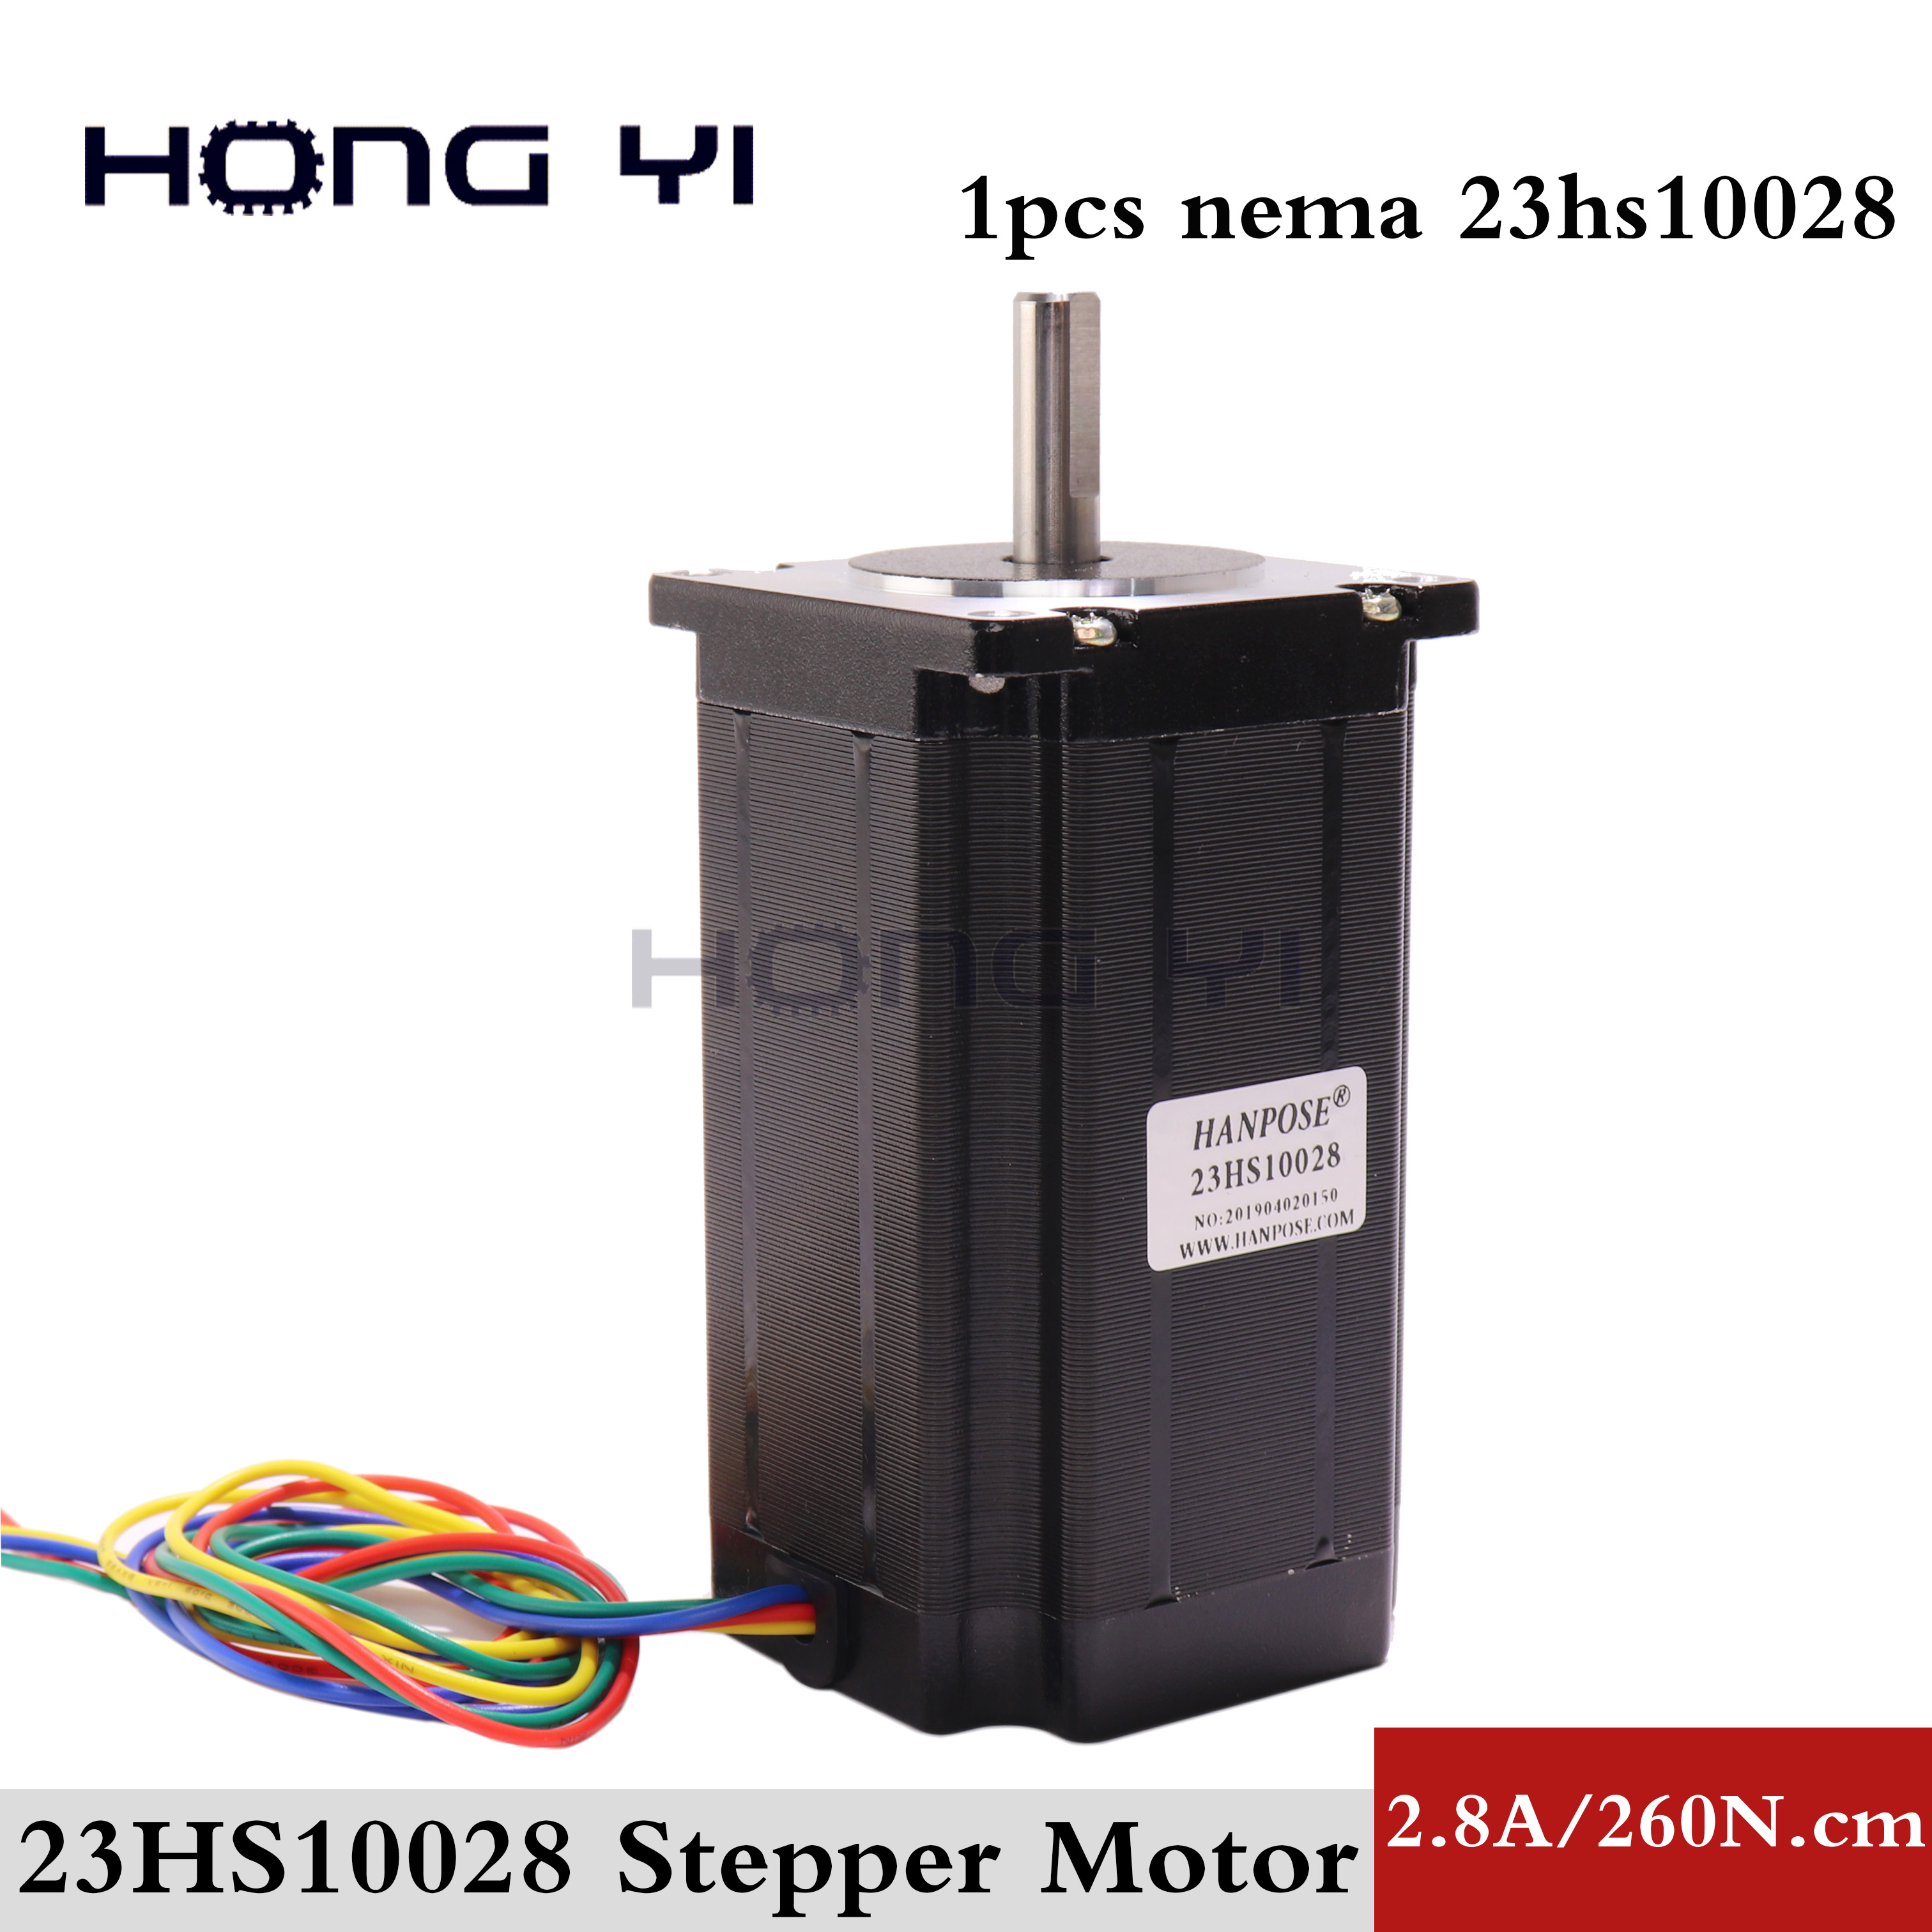 1 pcs 23HS10028 4 lead Nema 23 Stepper Motor 57 motor NEMA23 3 5A CE ROSH